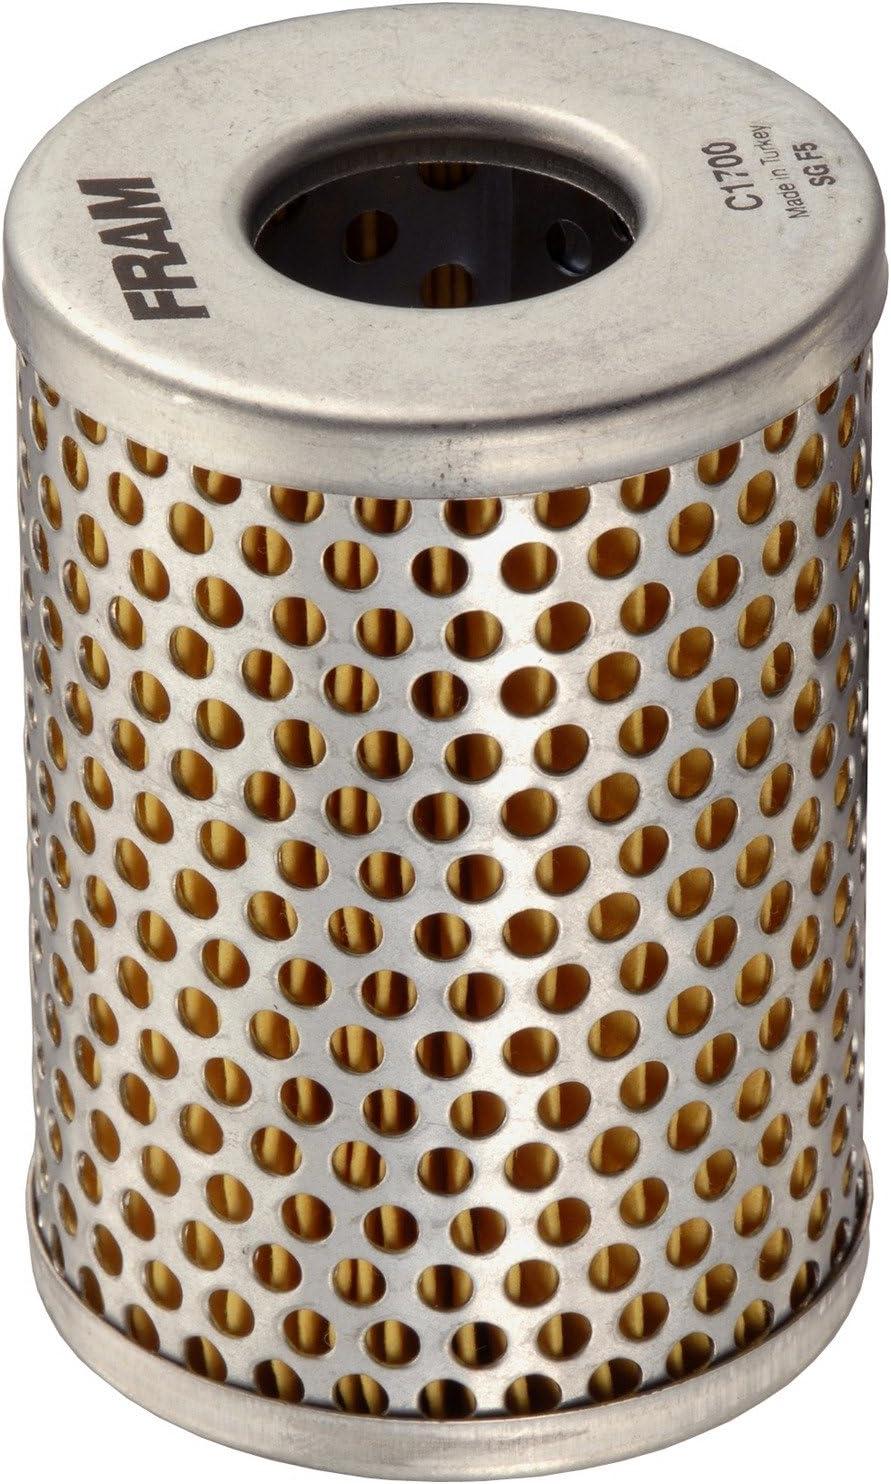 Free Shipping Cheap Bargain OFFer Gift FRAM C1700 Hydraulic Cartridge Filter